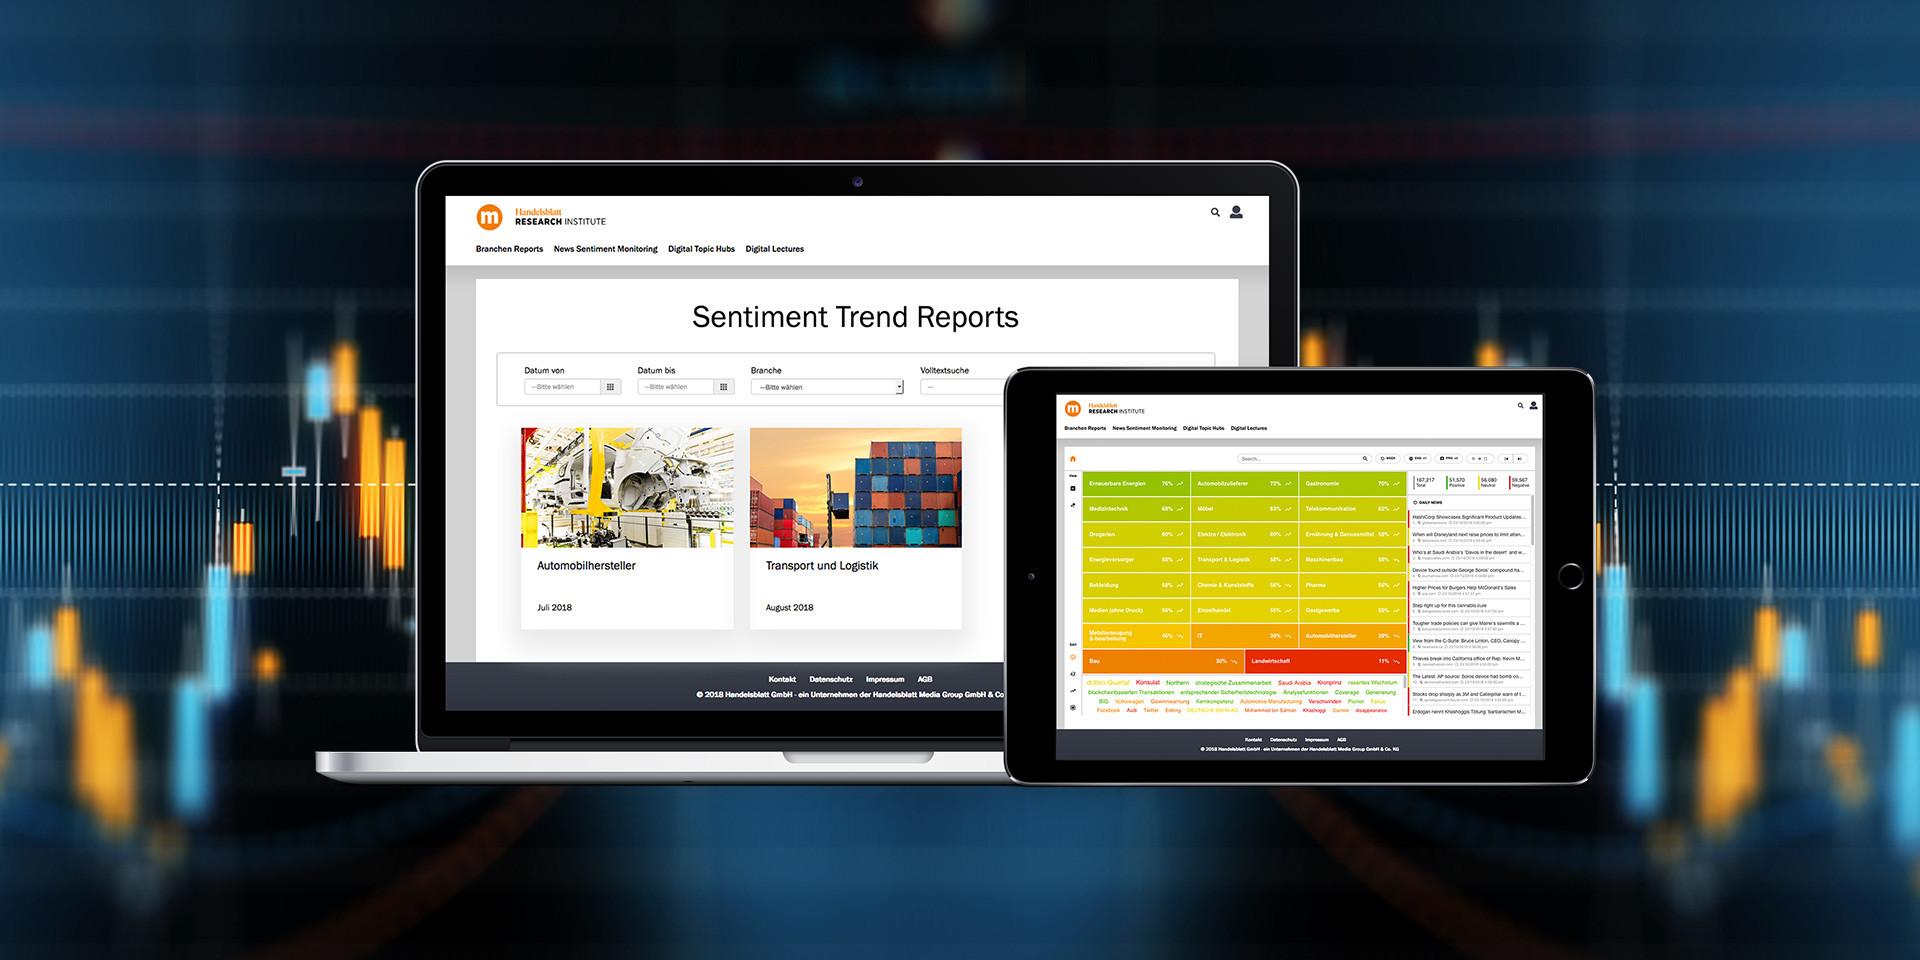 HRI Sentiment Trend Reports